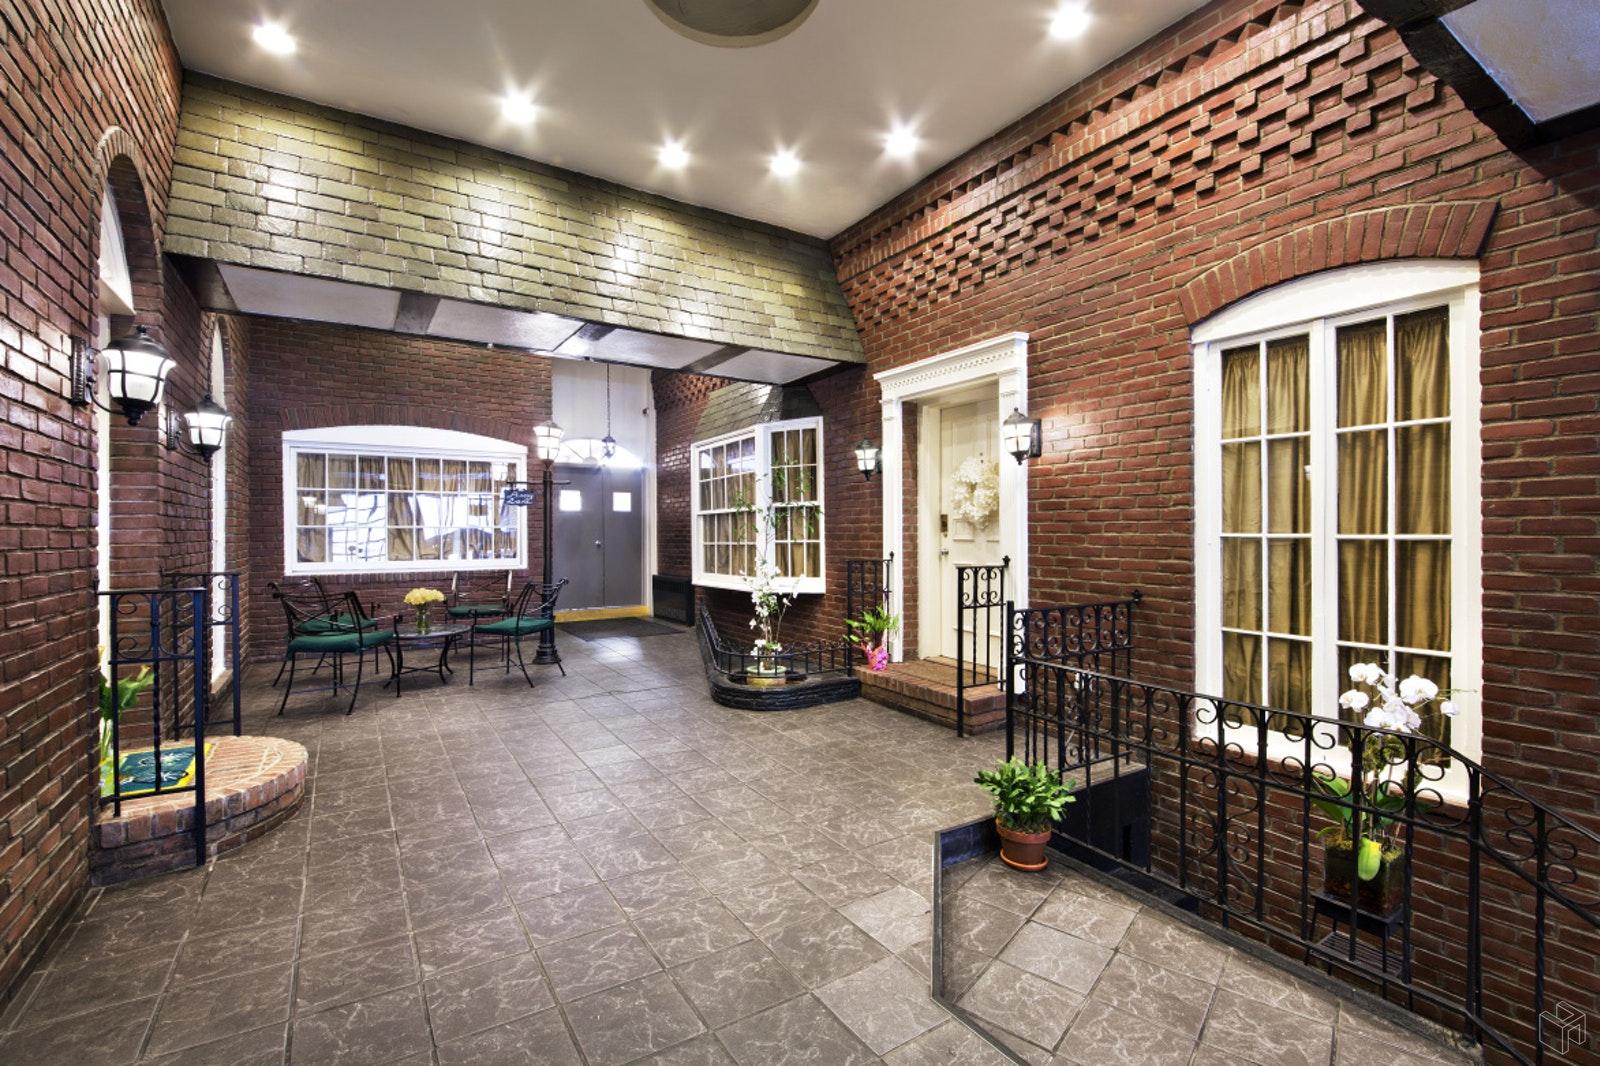 215 EAST 24TH STREET, Gramercy Park, $0, Web #: 19496695